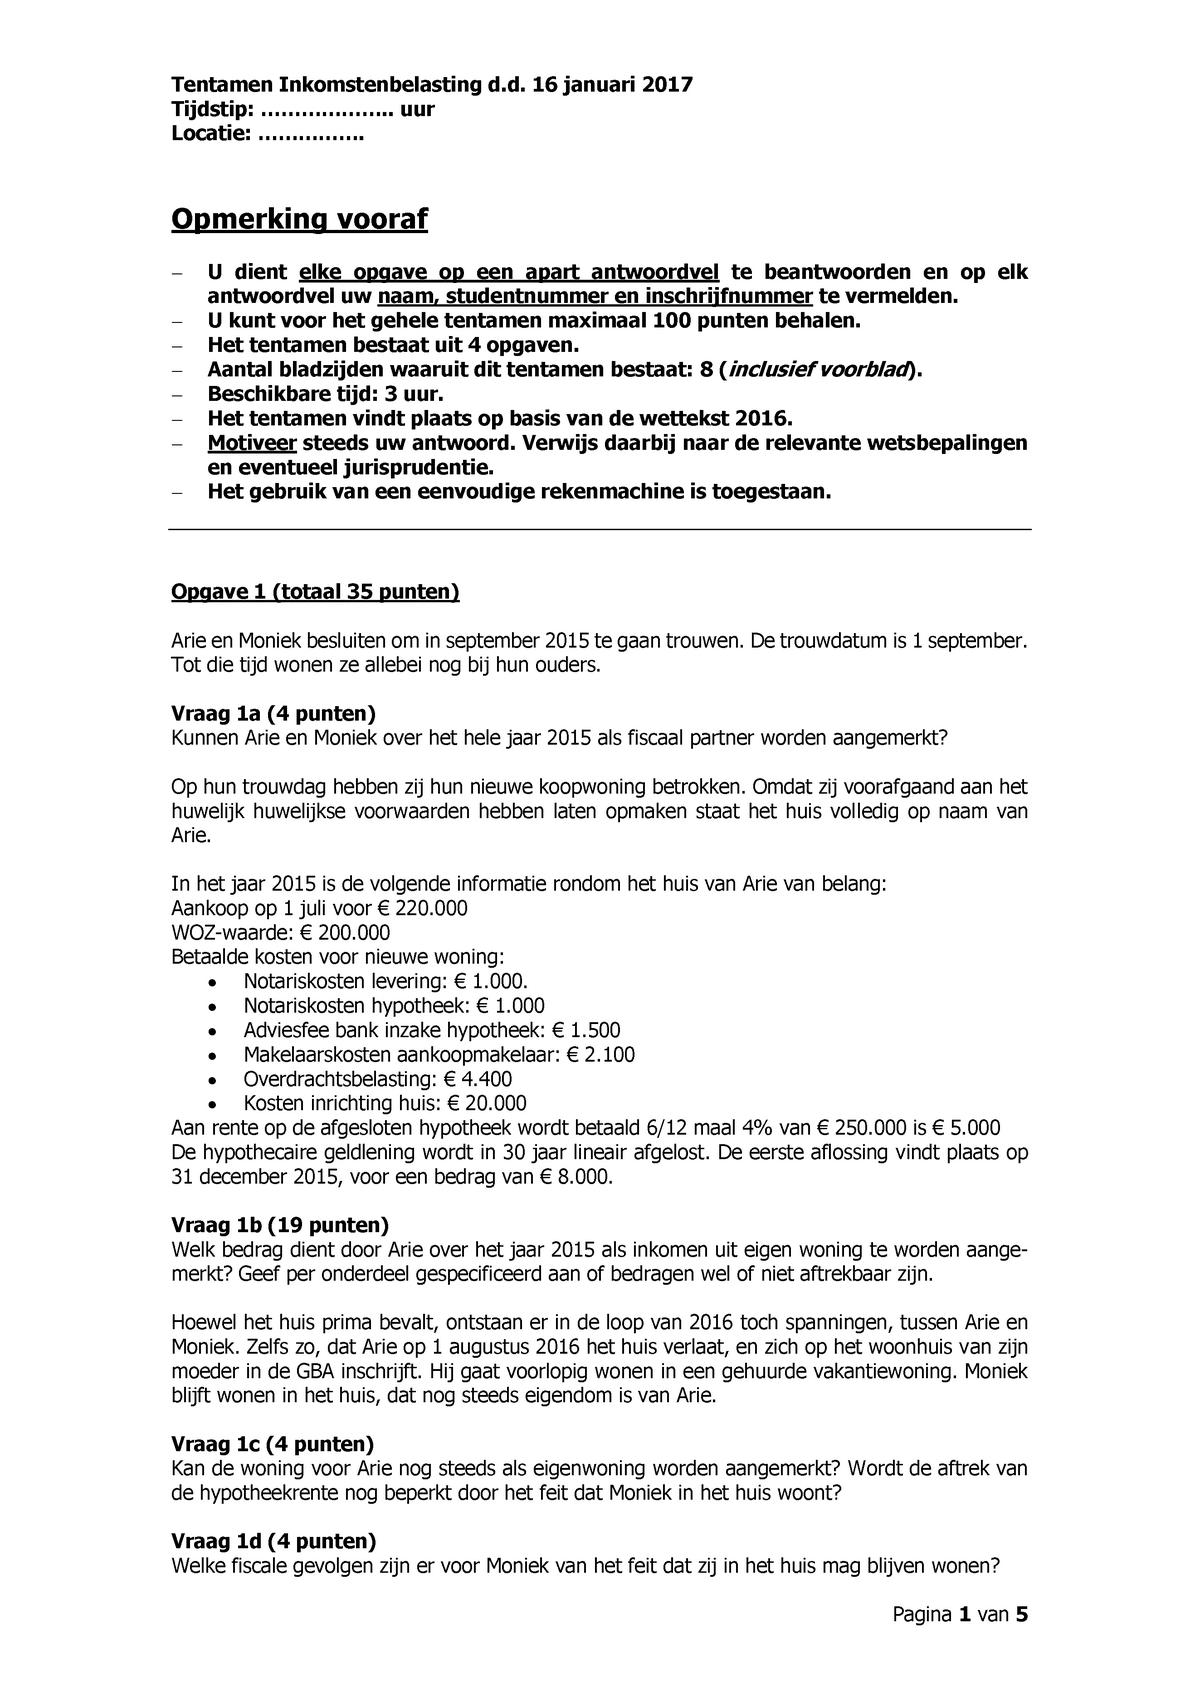 Tentamen Inkomstenbelasting Kans 1 Januari 2017 Studeersnel